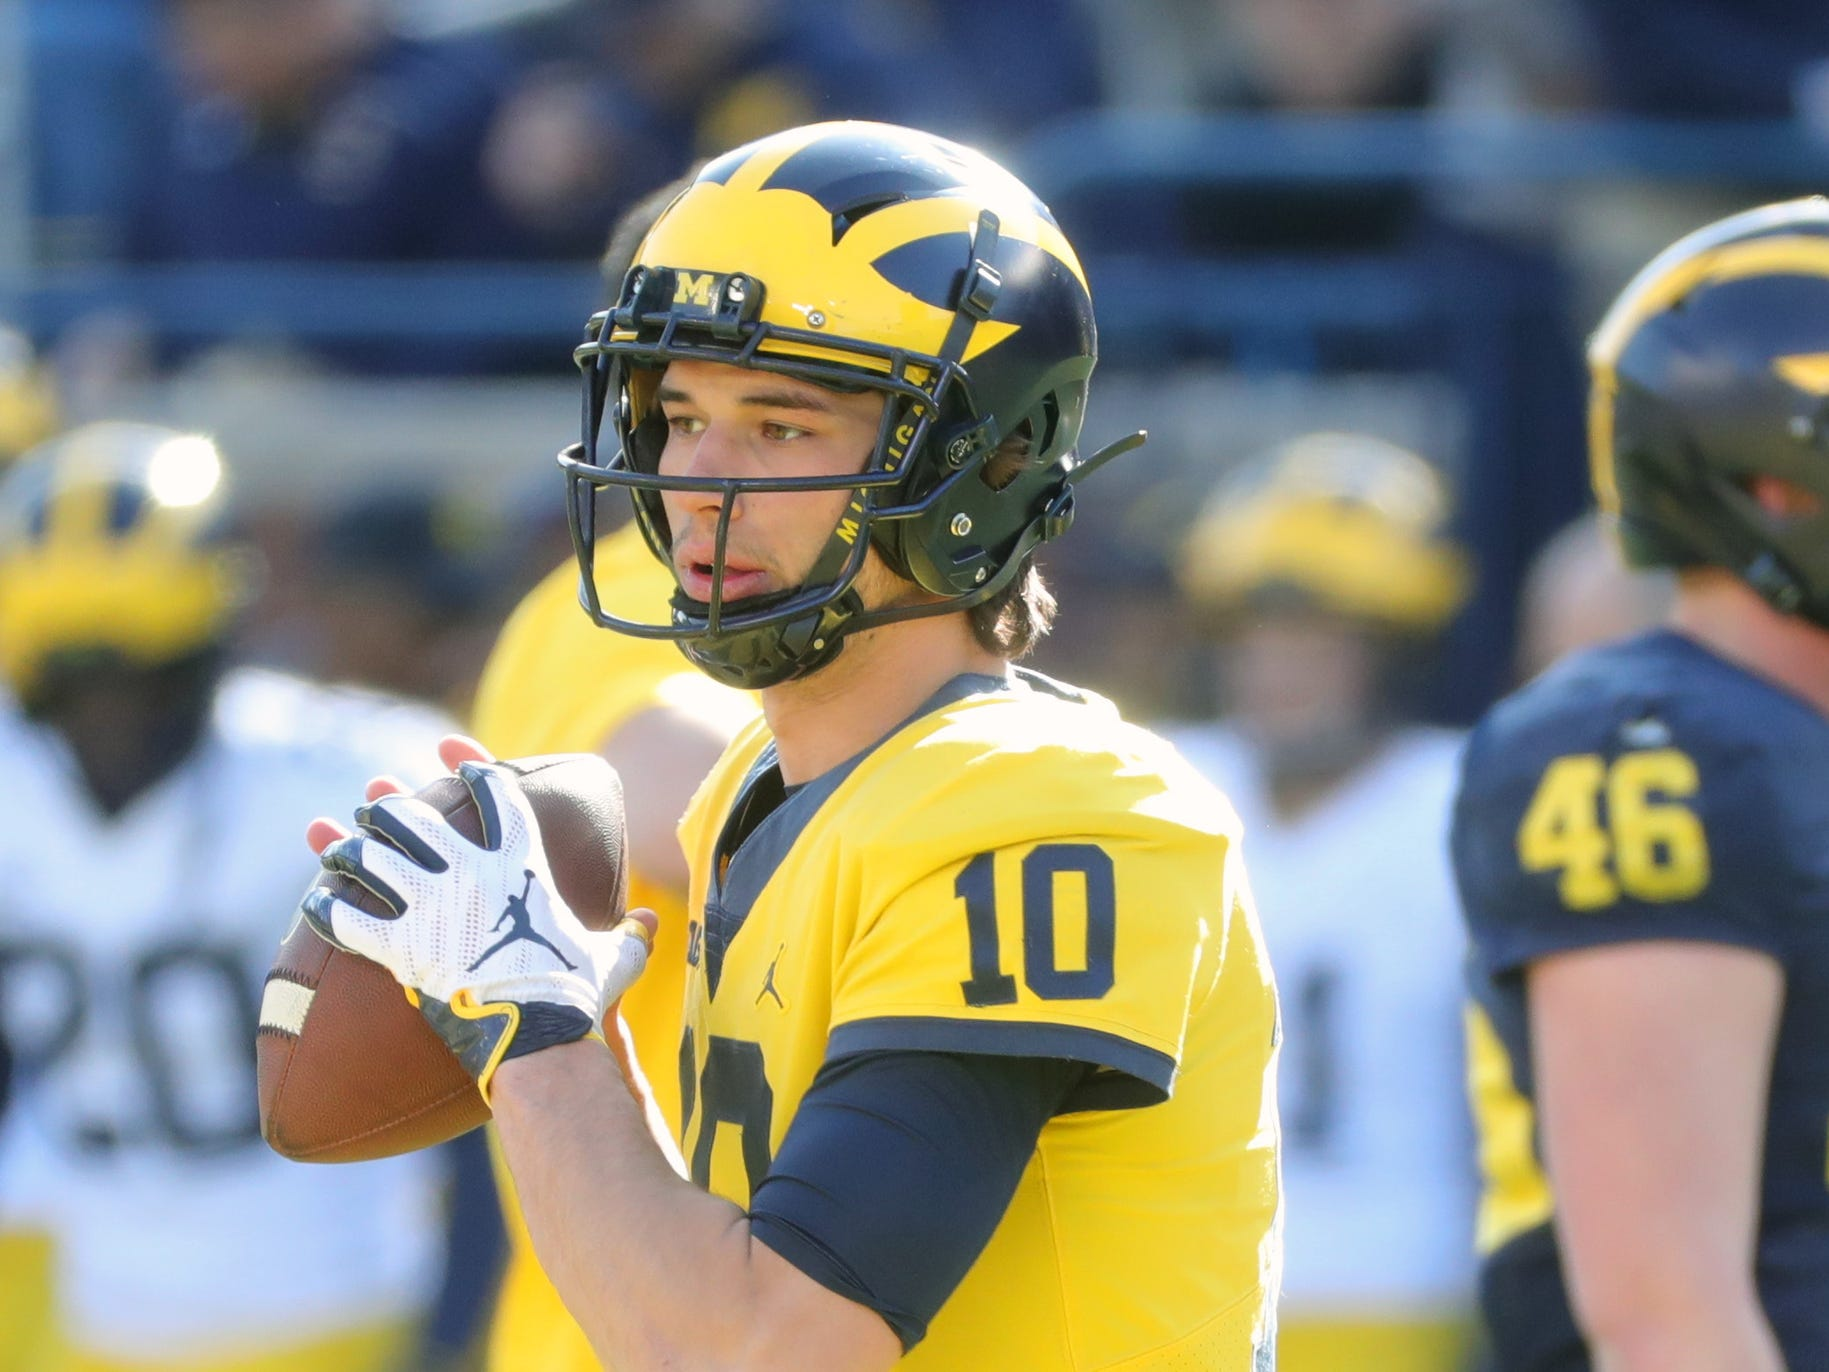 Michigan quarterback Dylan McCaffrey passes during the spring game Saturday, April 13, 2019 at Michigan Stadium in Ann Arbor.